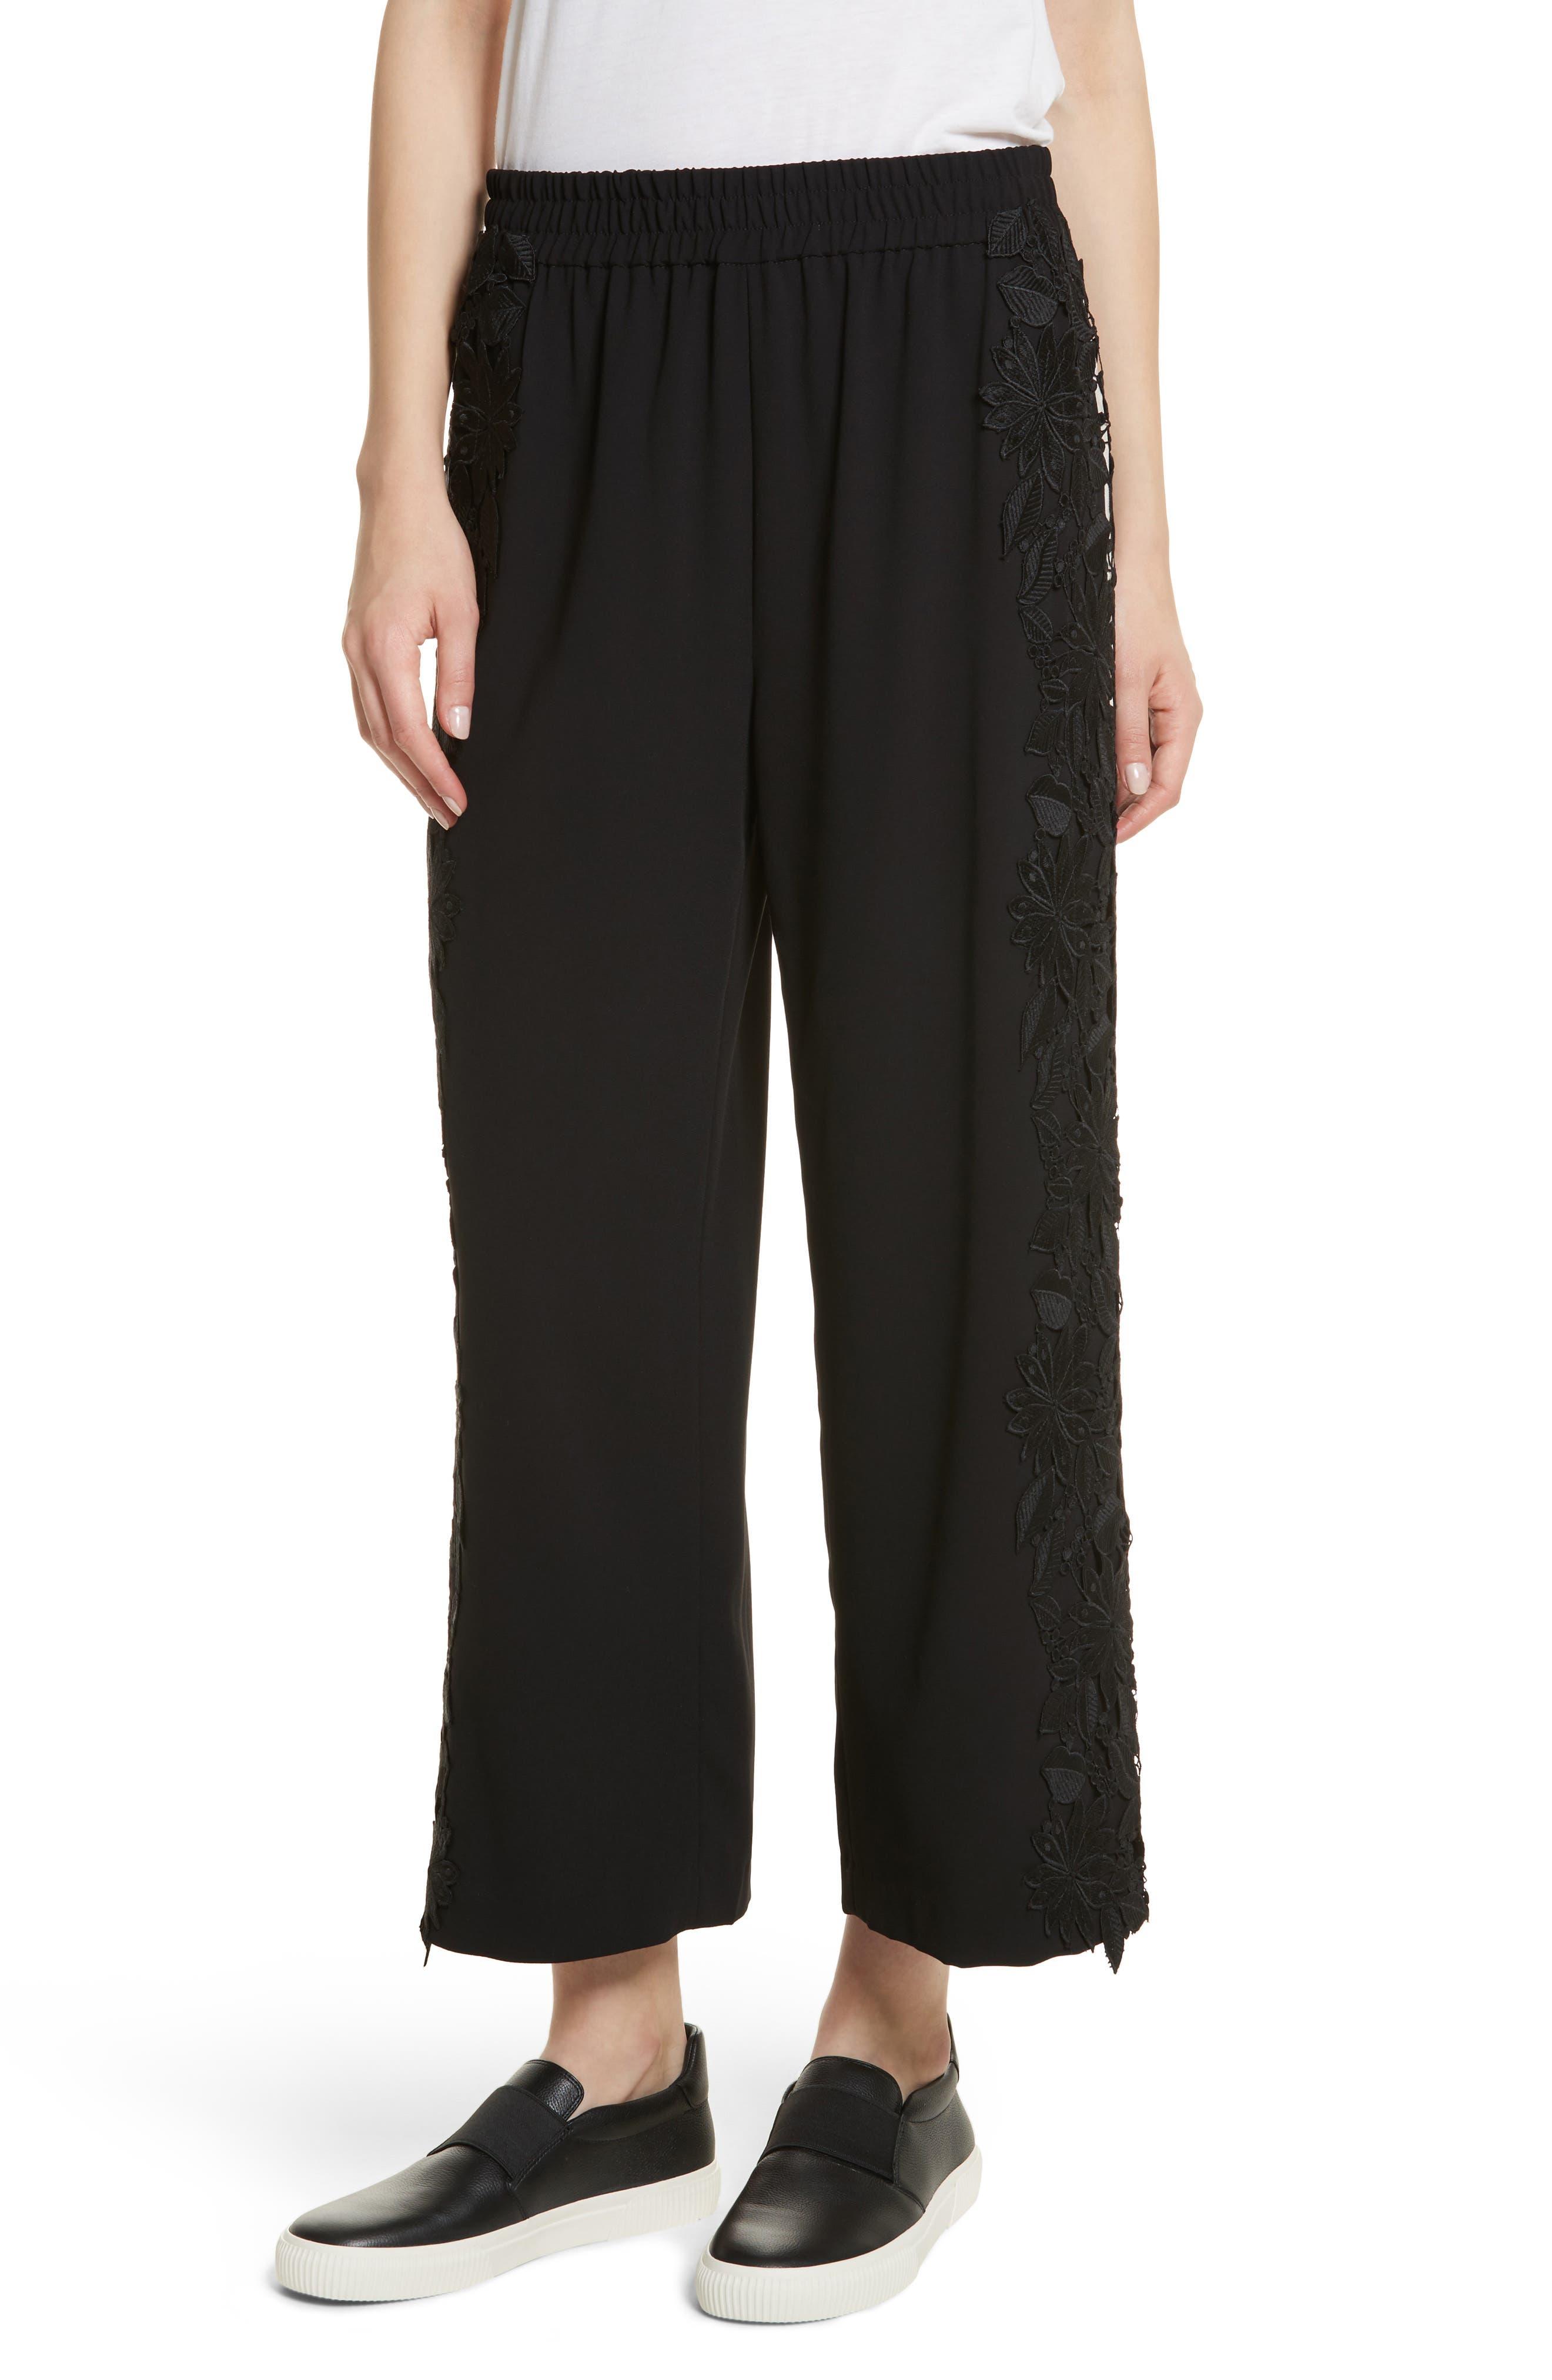 Alternate Image 1 Selected - Alice + Olivia Benny Side Lace Crop Pants